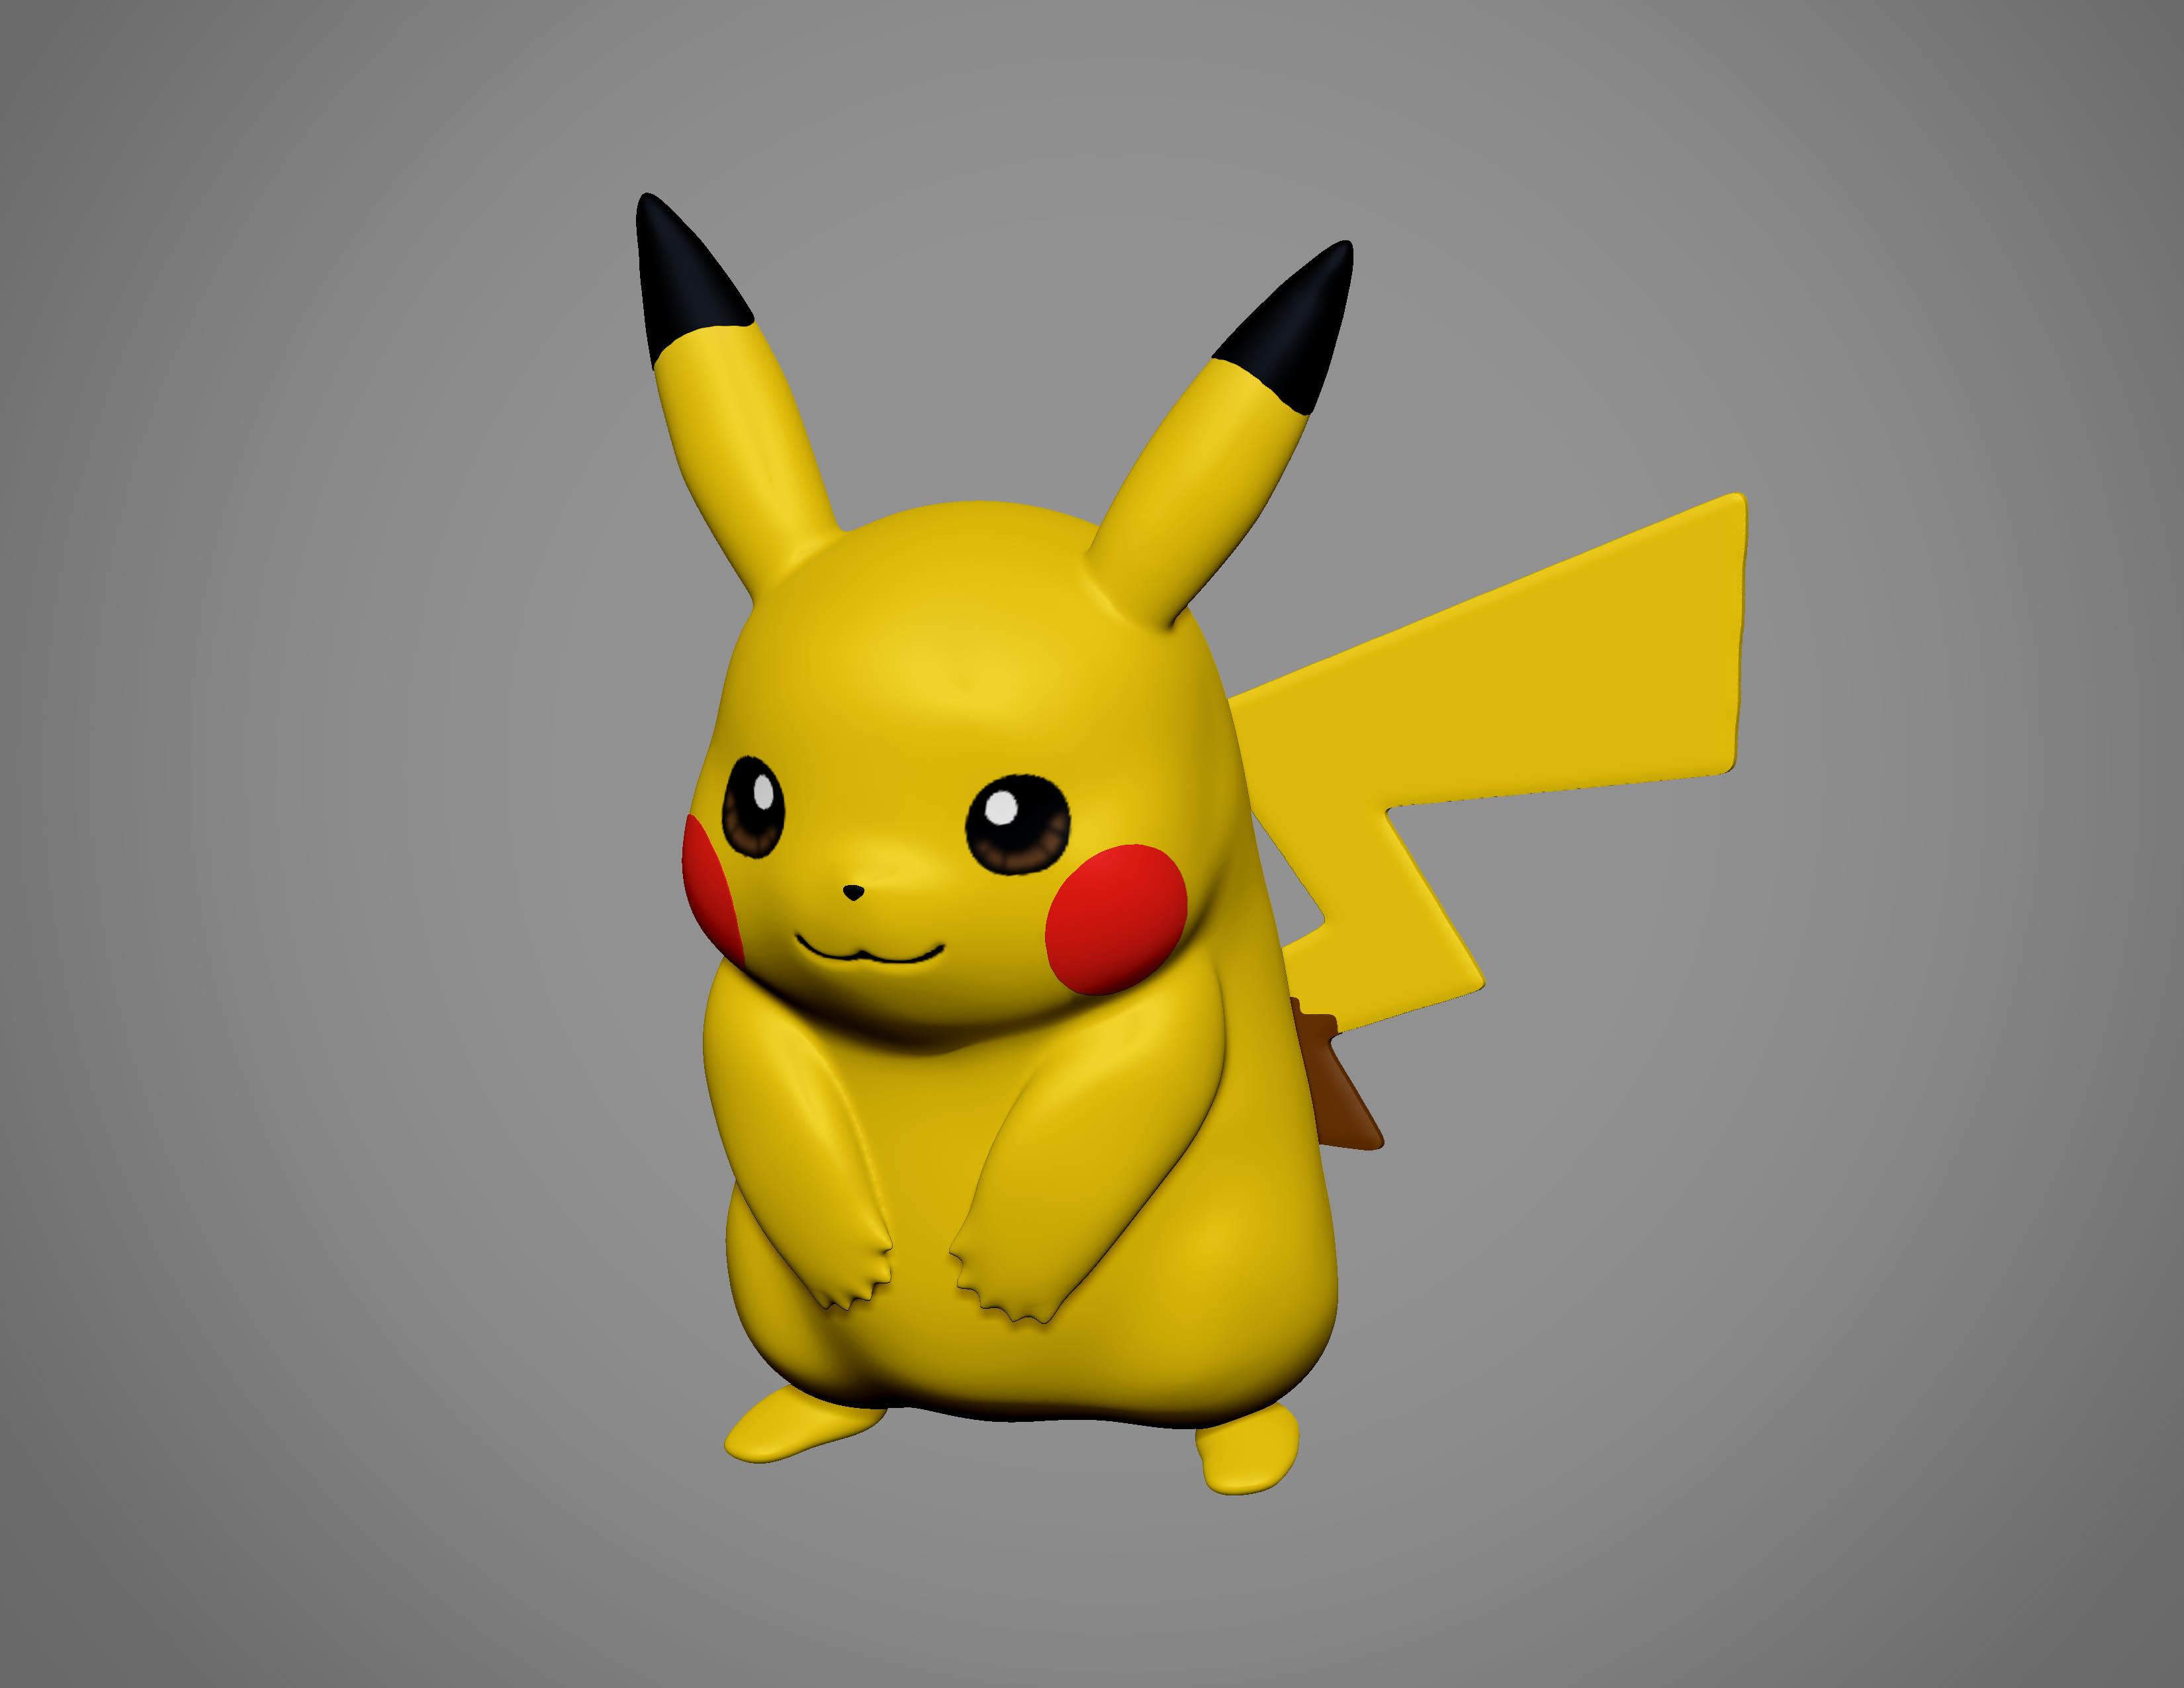 3d Pokemon Pikachu Model Turbosquid 1264841